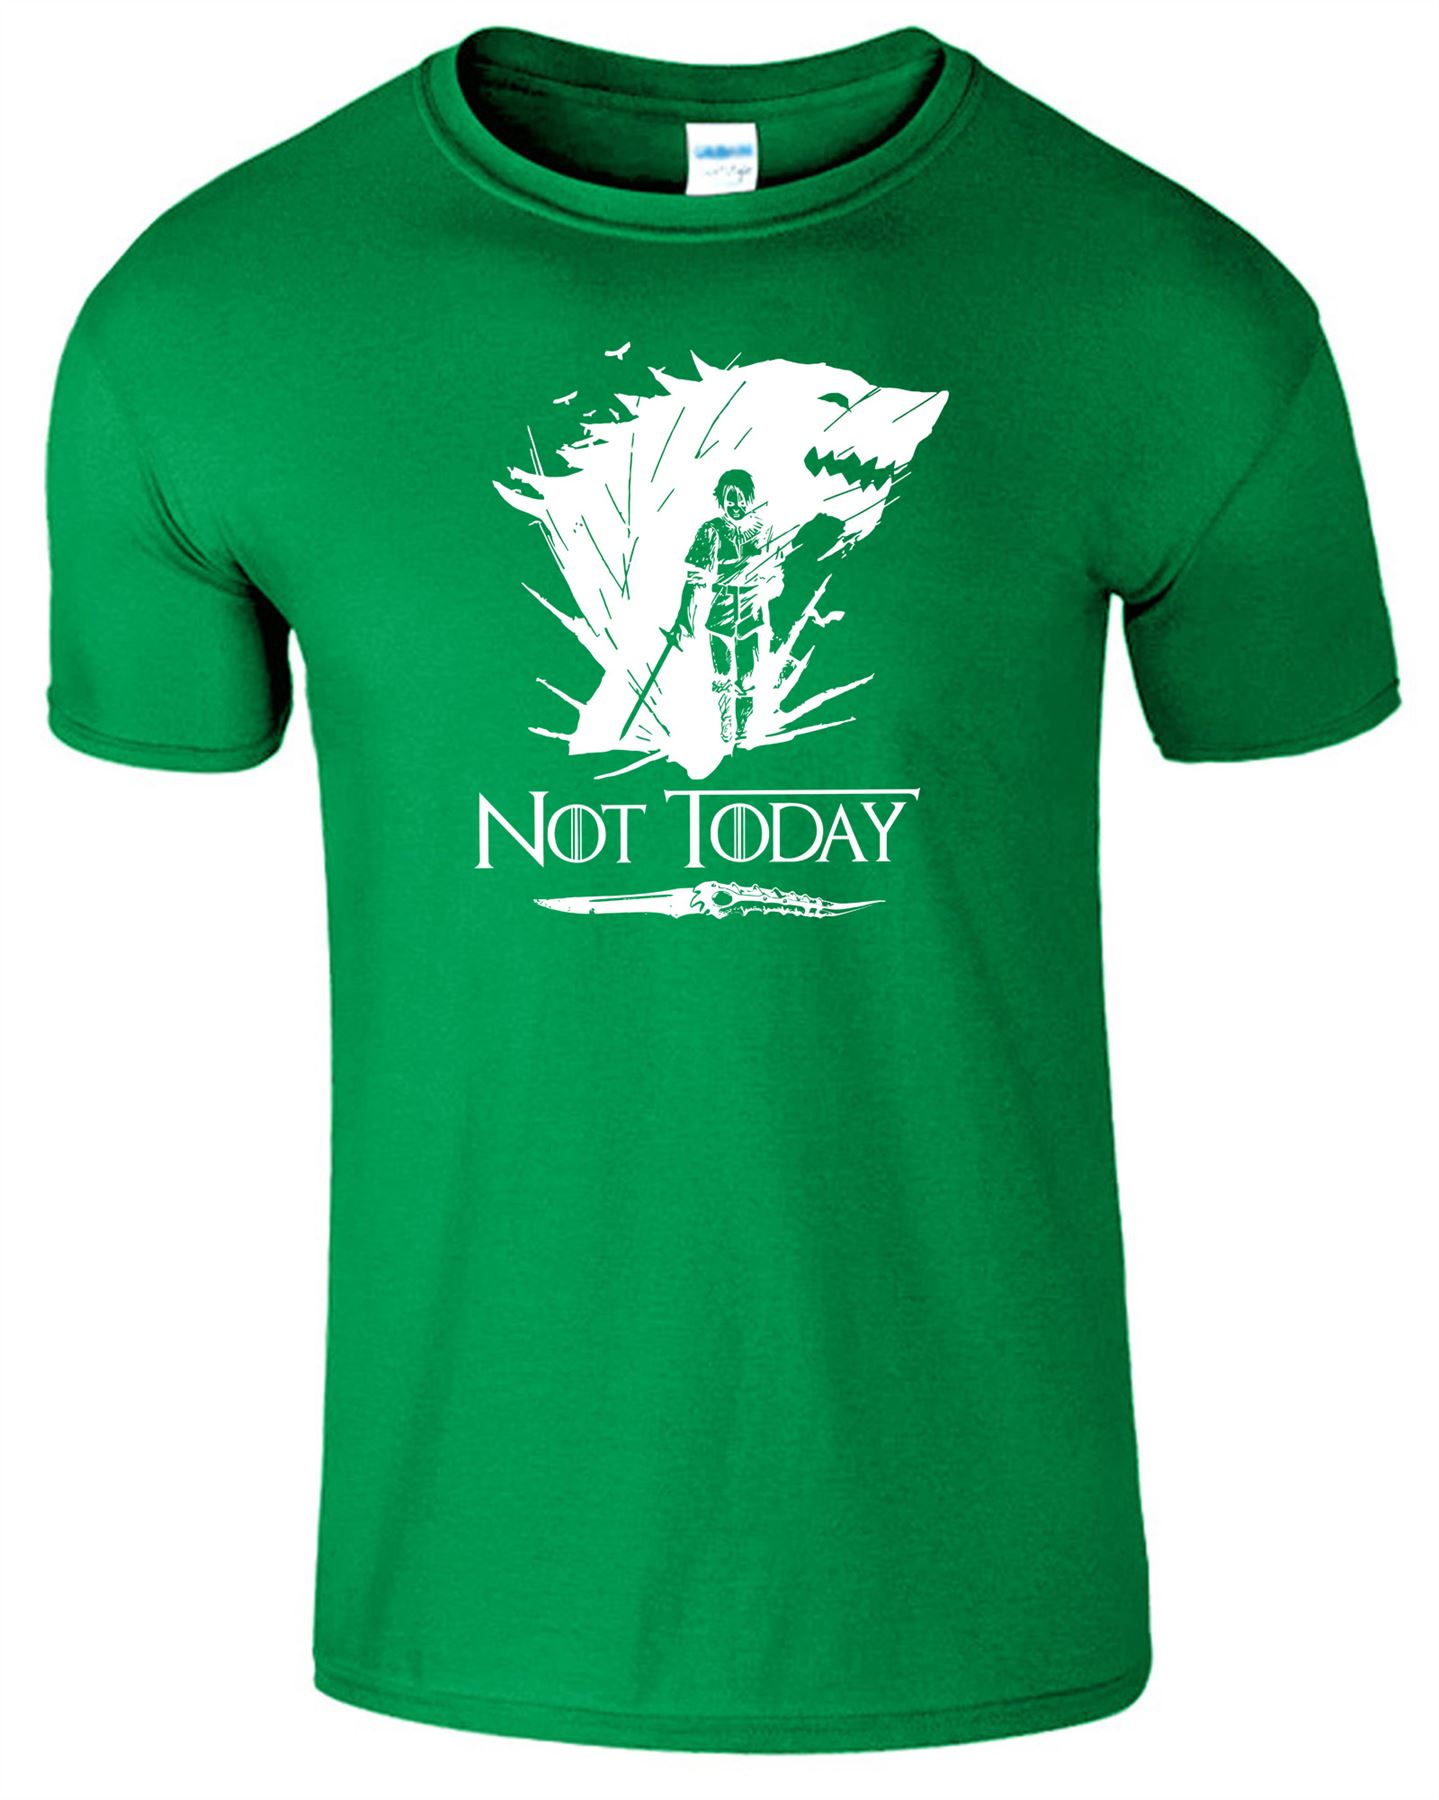 Arya-Stark-Not-Today-T-Shirt-Mens-Game-Season-Womens-Shirt-Adults-Unisex-Fit Indexbild 24